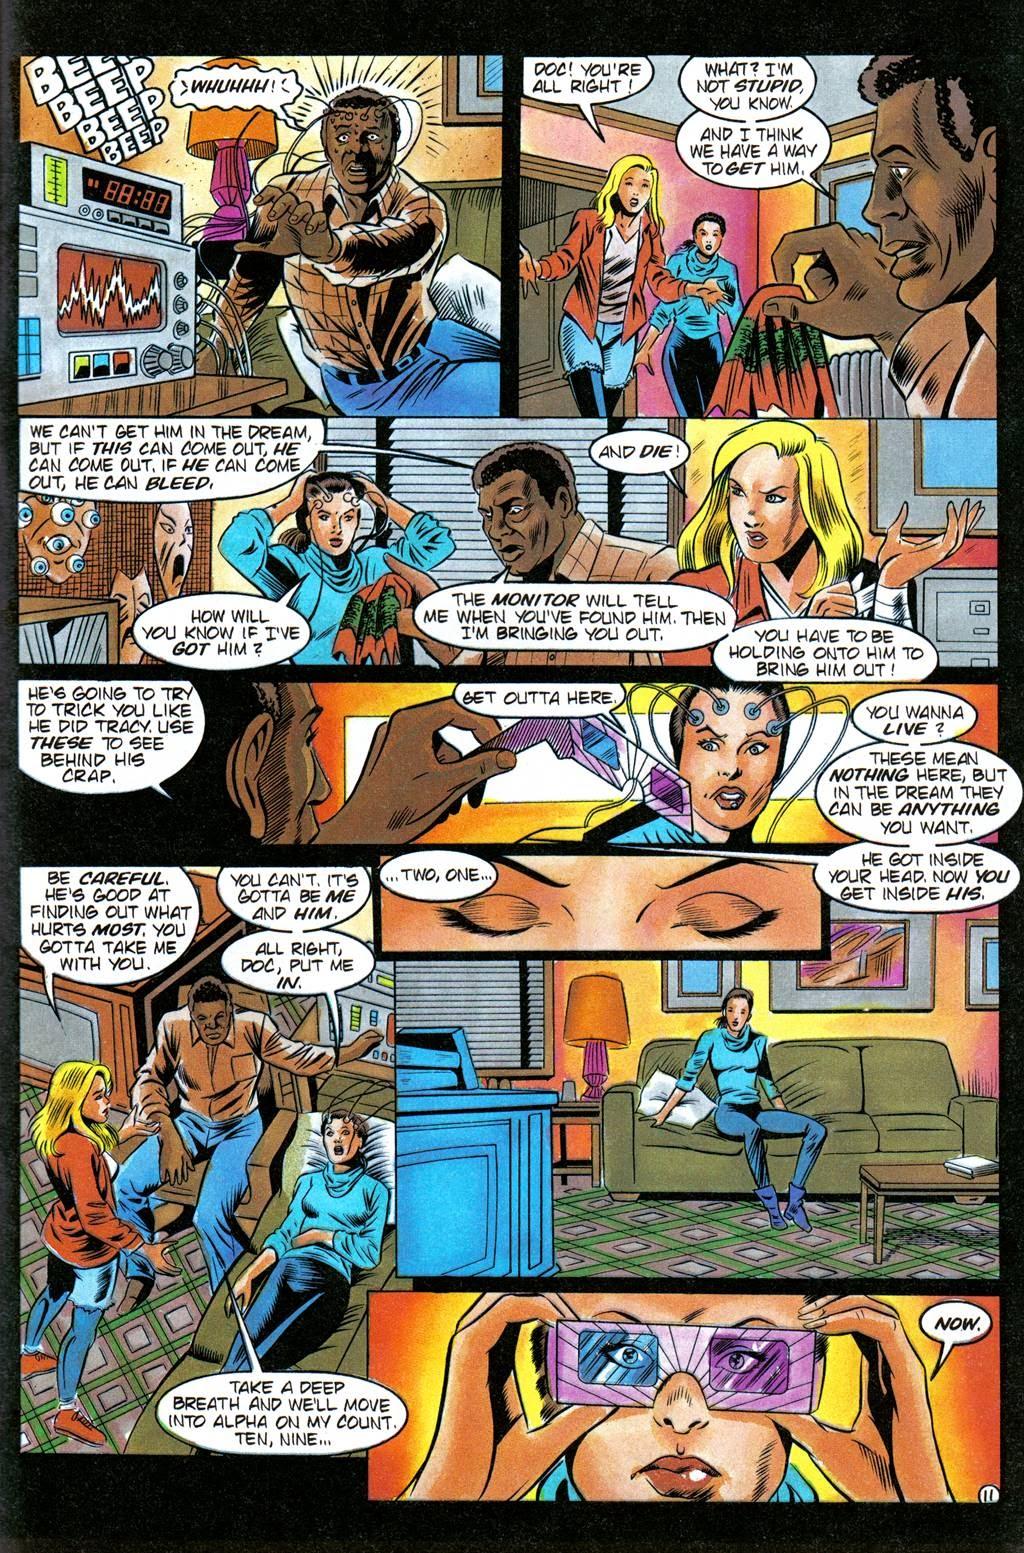 Read online Freddy's Dead: The Final Nightmare comic -  Issue #3 - 13